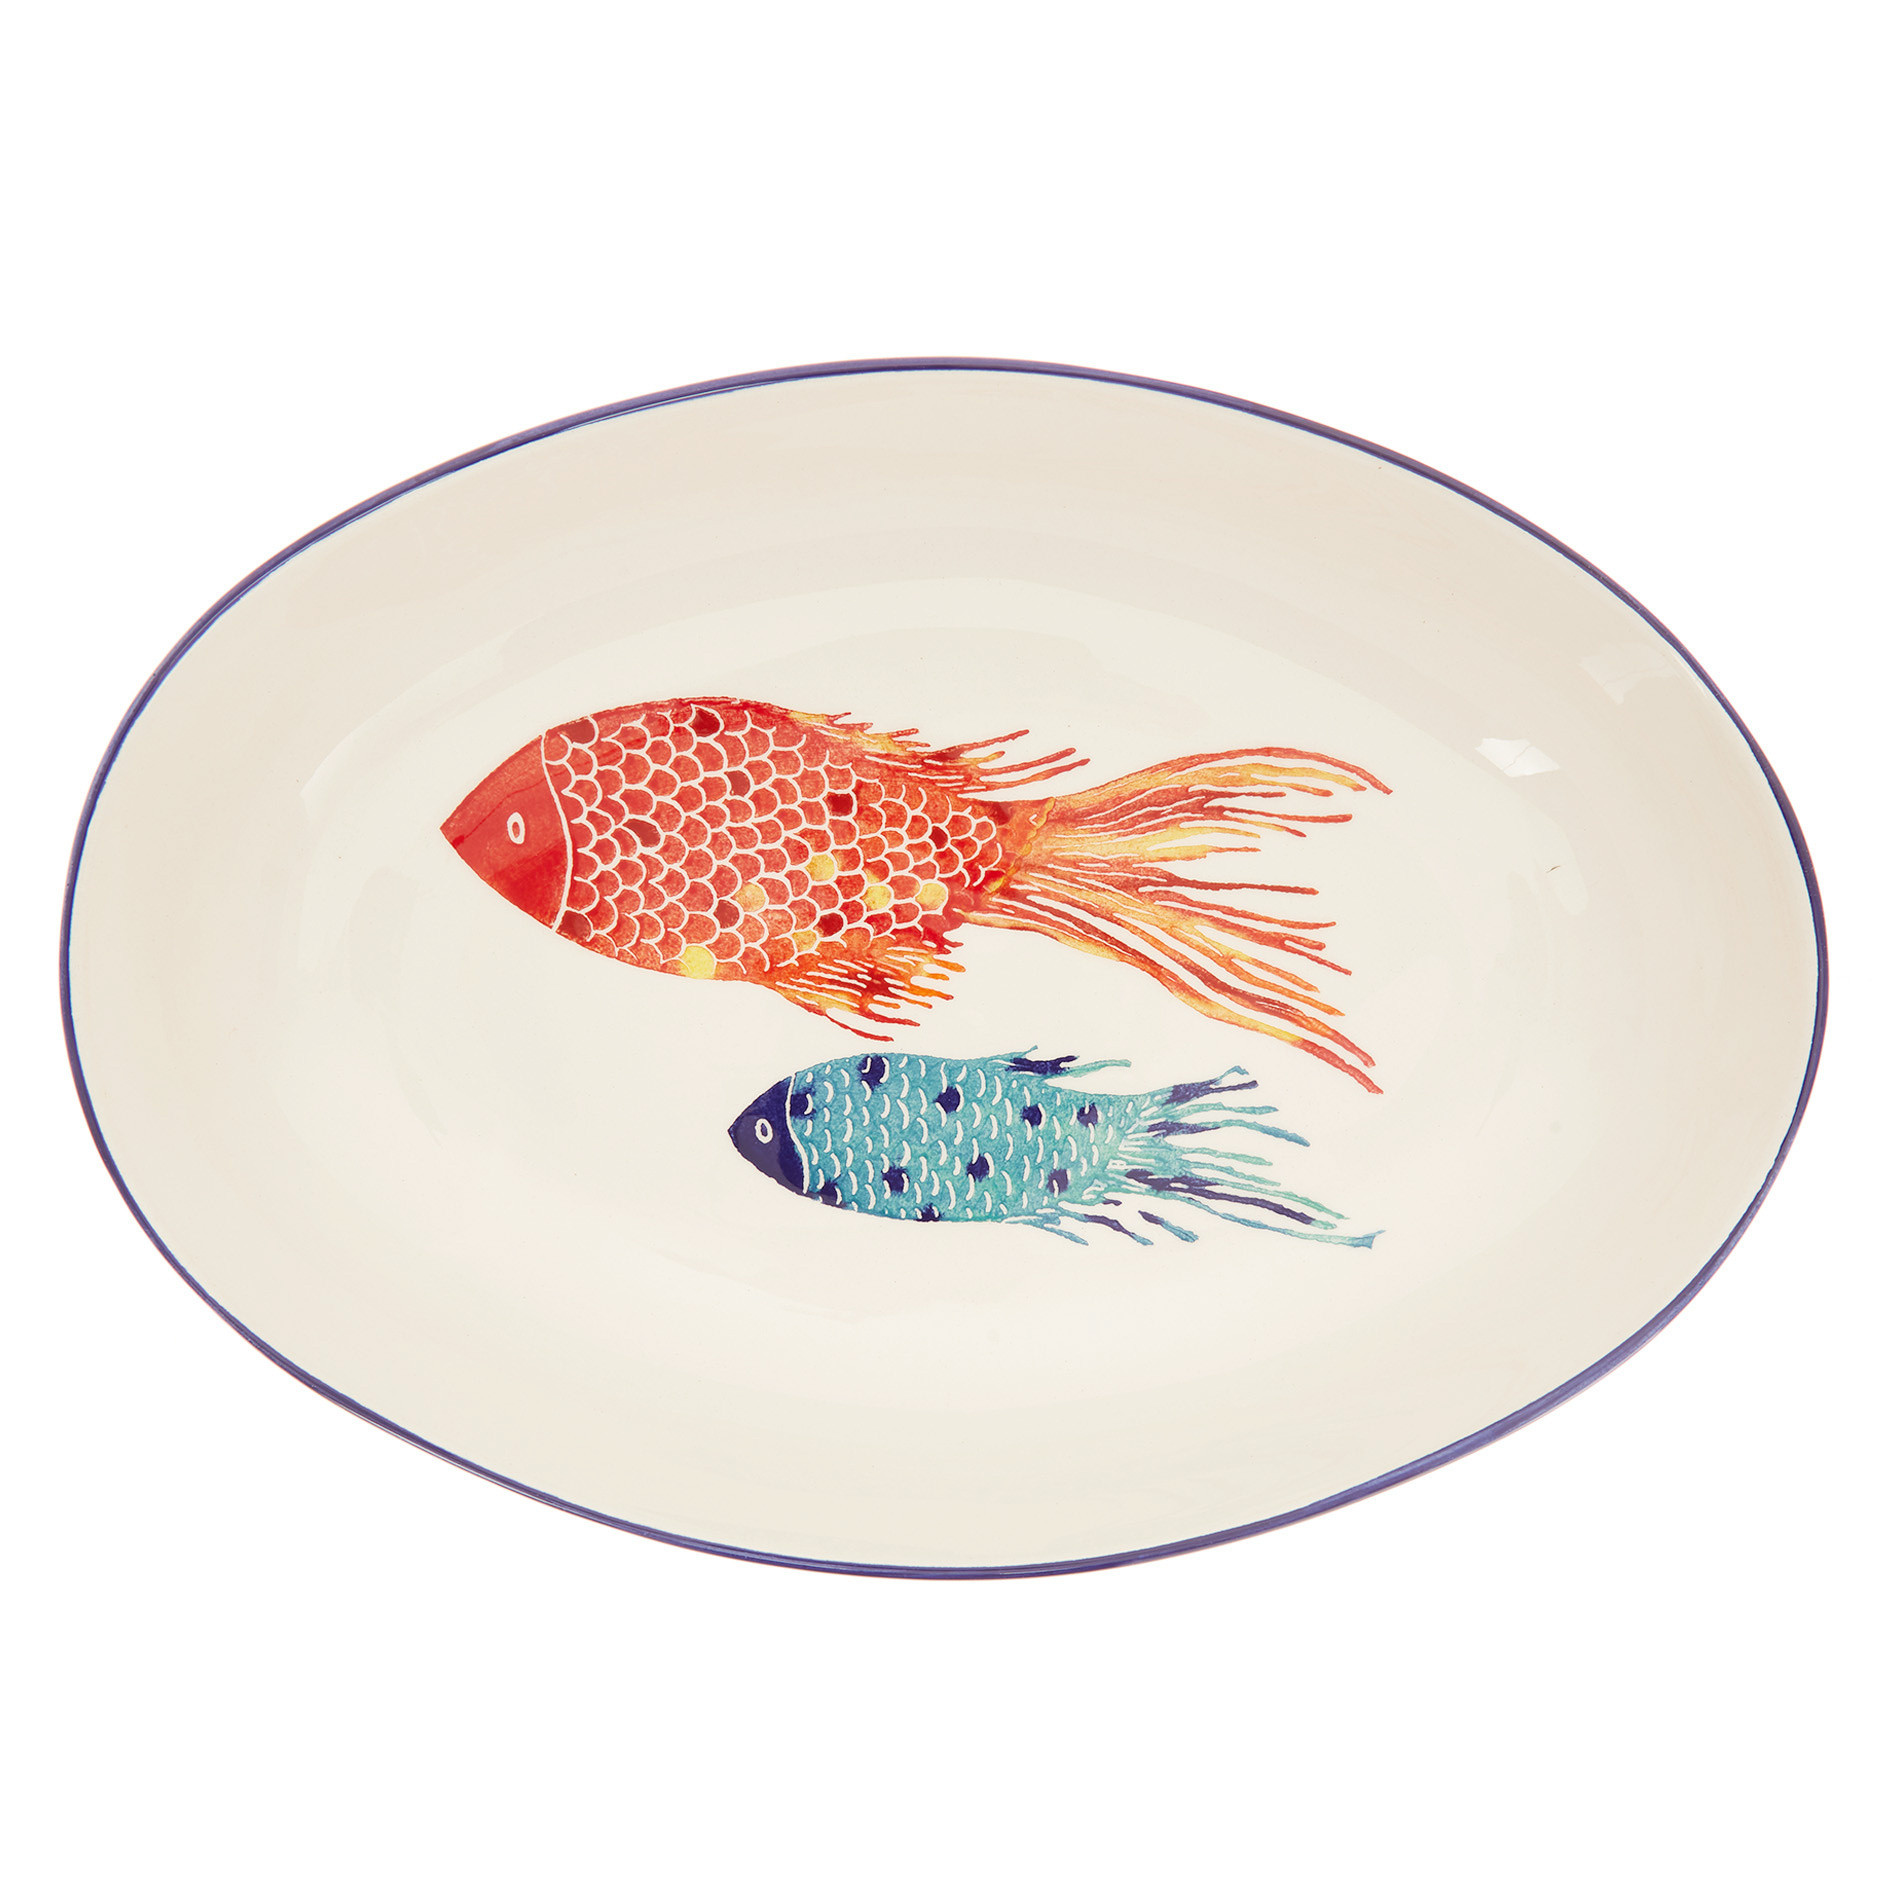 Coppa ceramica decoro pesci, Bianco/Multicolor, large image number 0